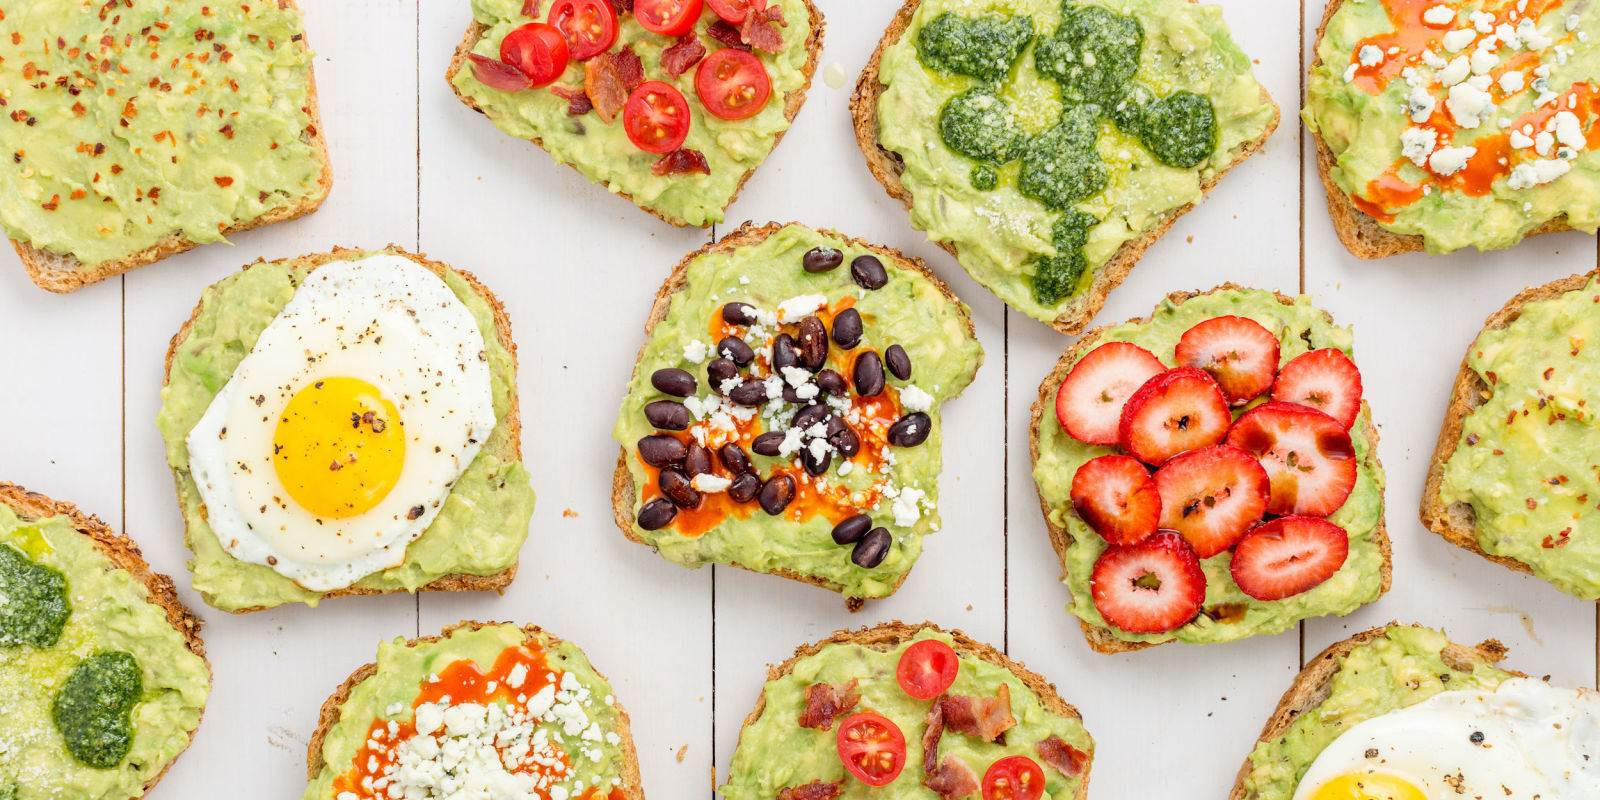 Healthy Tasty Snacks  5 Tasty And Healthy Study Snacks